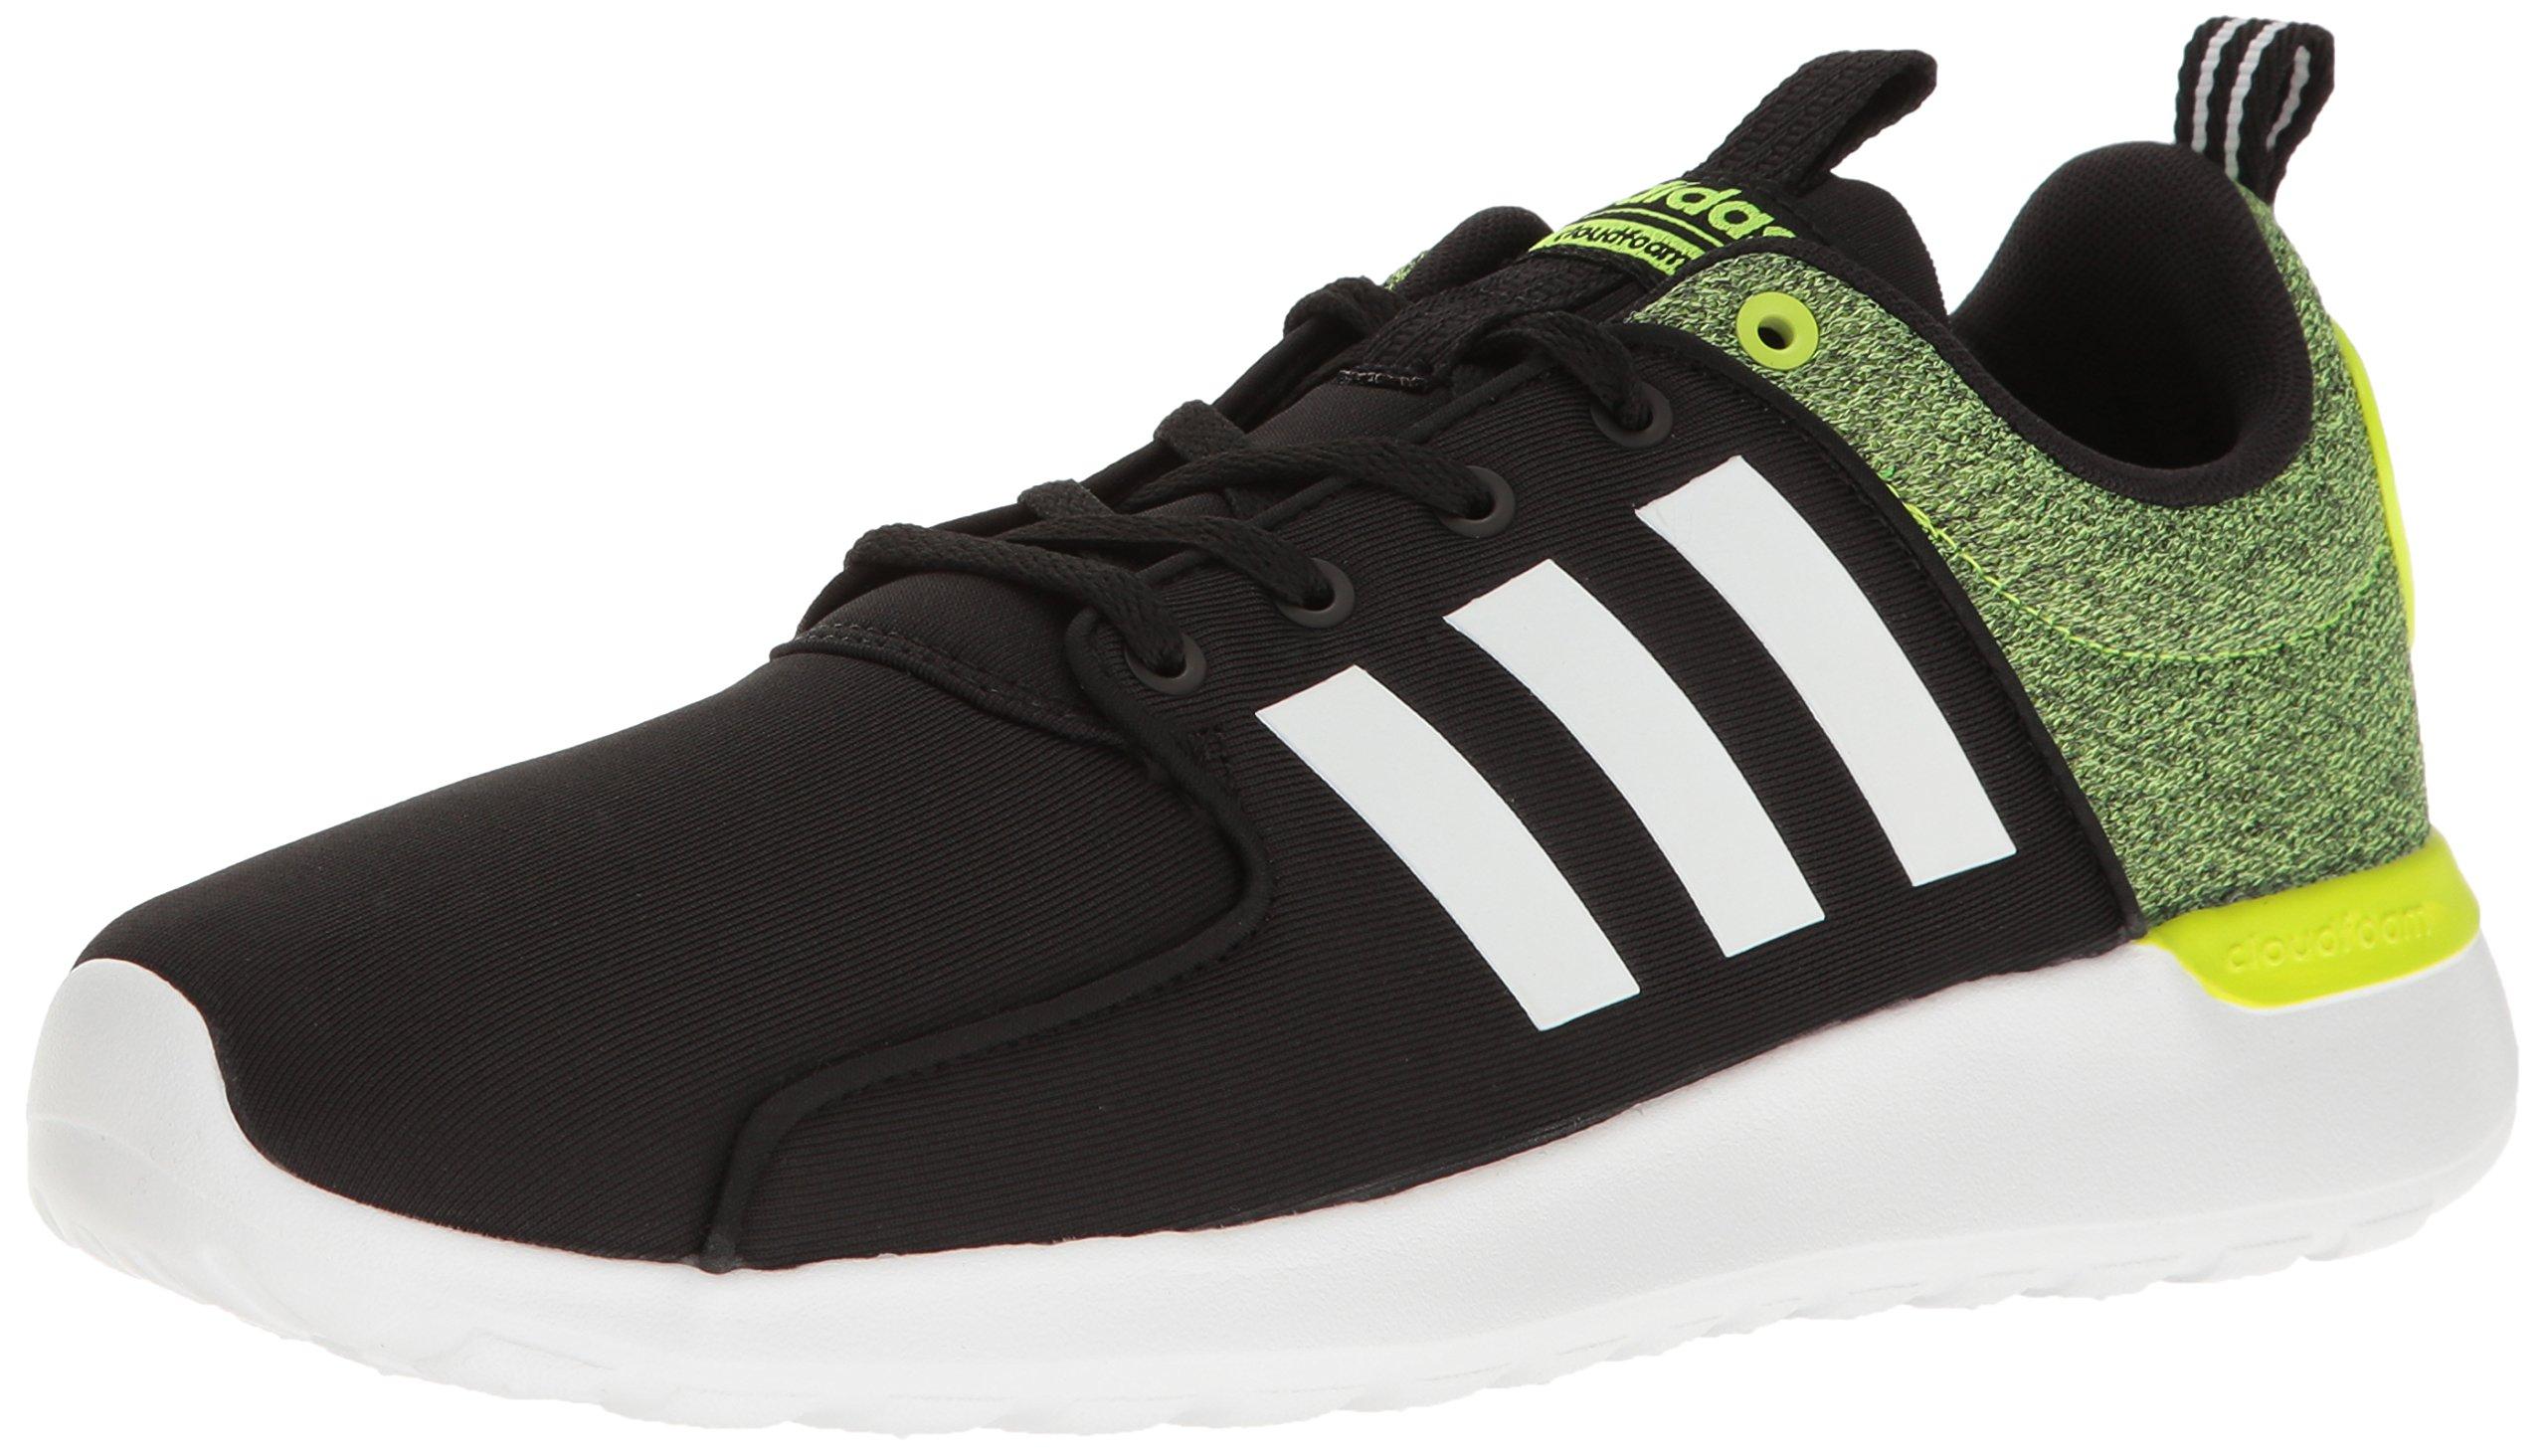 70c8a2330 Galleon - Adidas Men s Cloudfoam Lite Racer Running Shoe